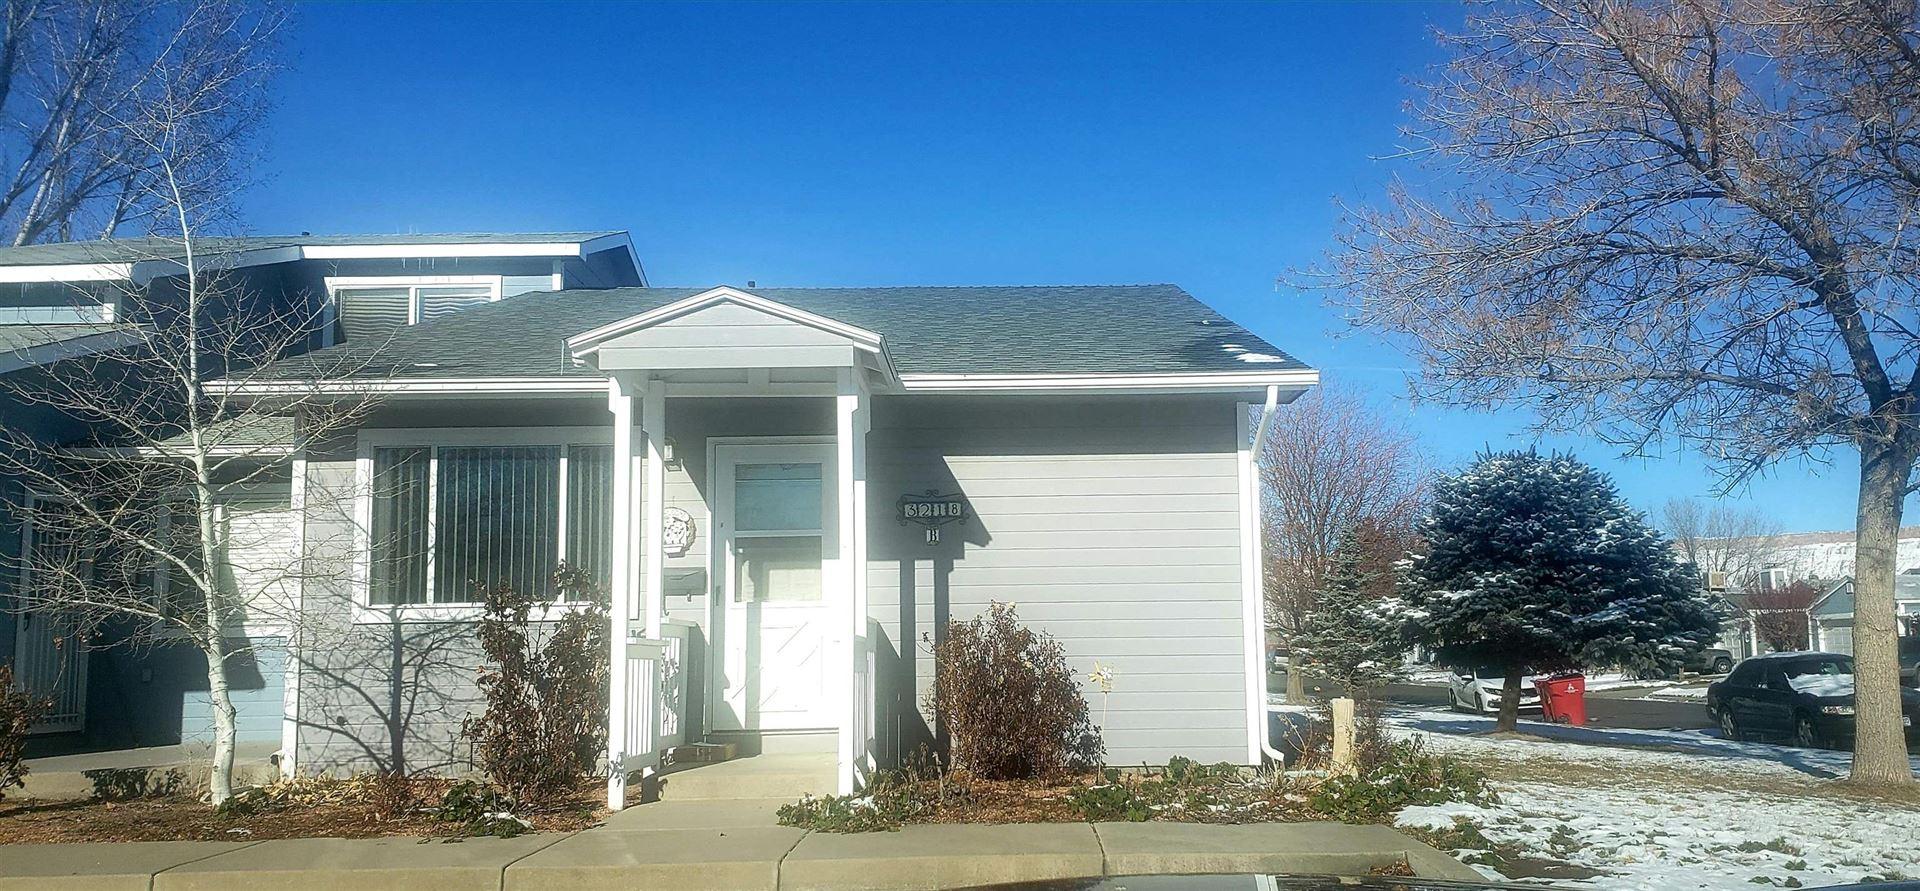 Photo of 3218 D 7/8 Road #B, Clifton, CO 81520 (MLS # 20215741)